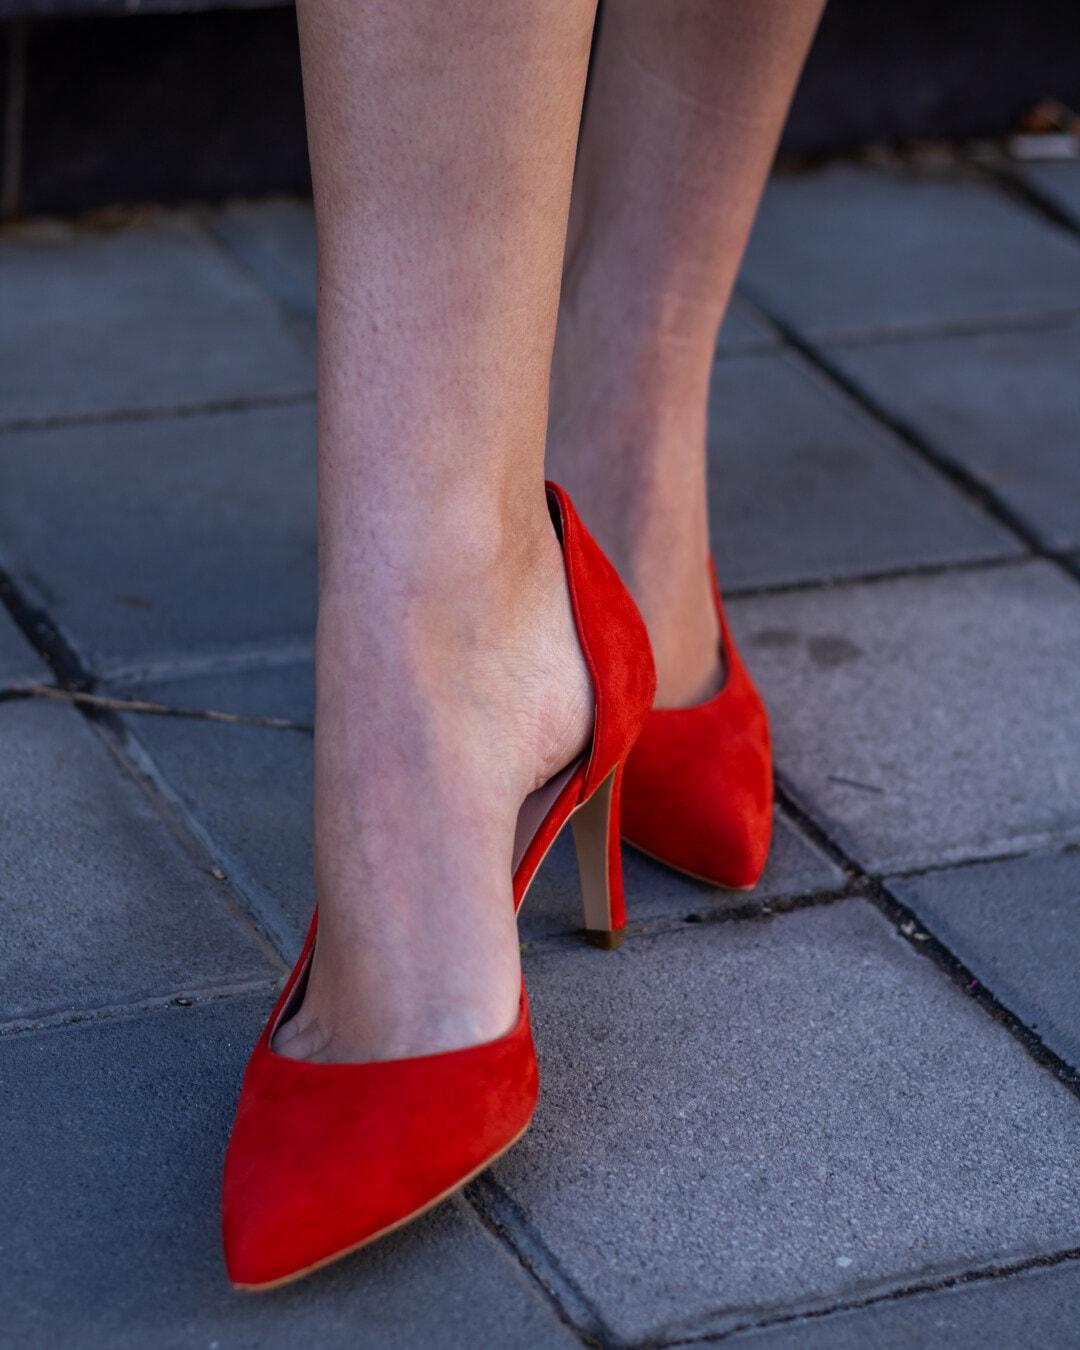 червен, класически, обувки, токчета, бос, крак, мода, момиче, обувки, жена